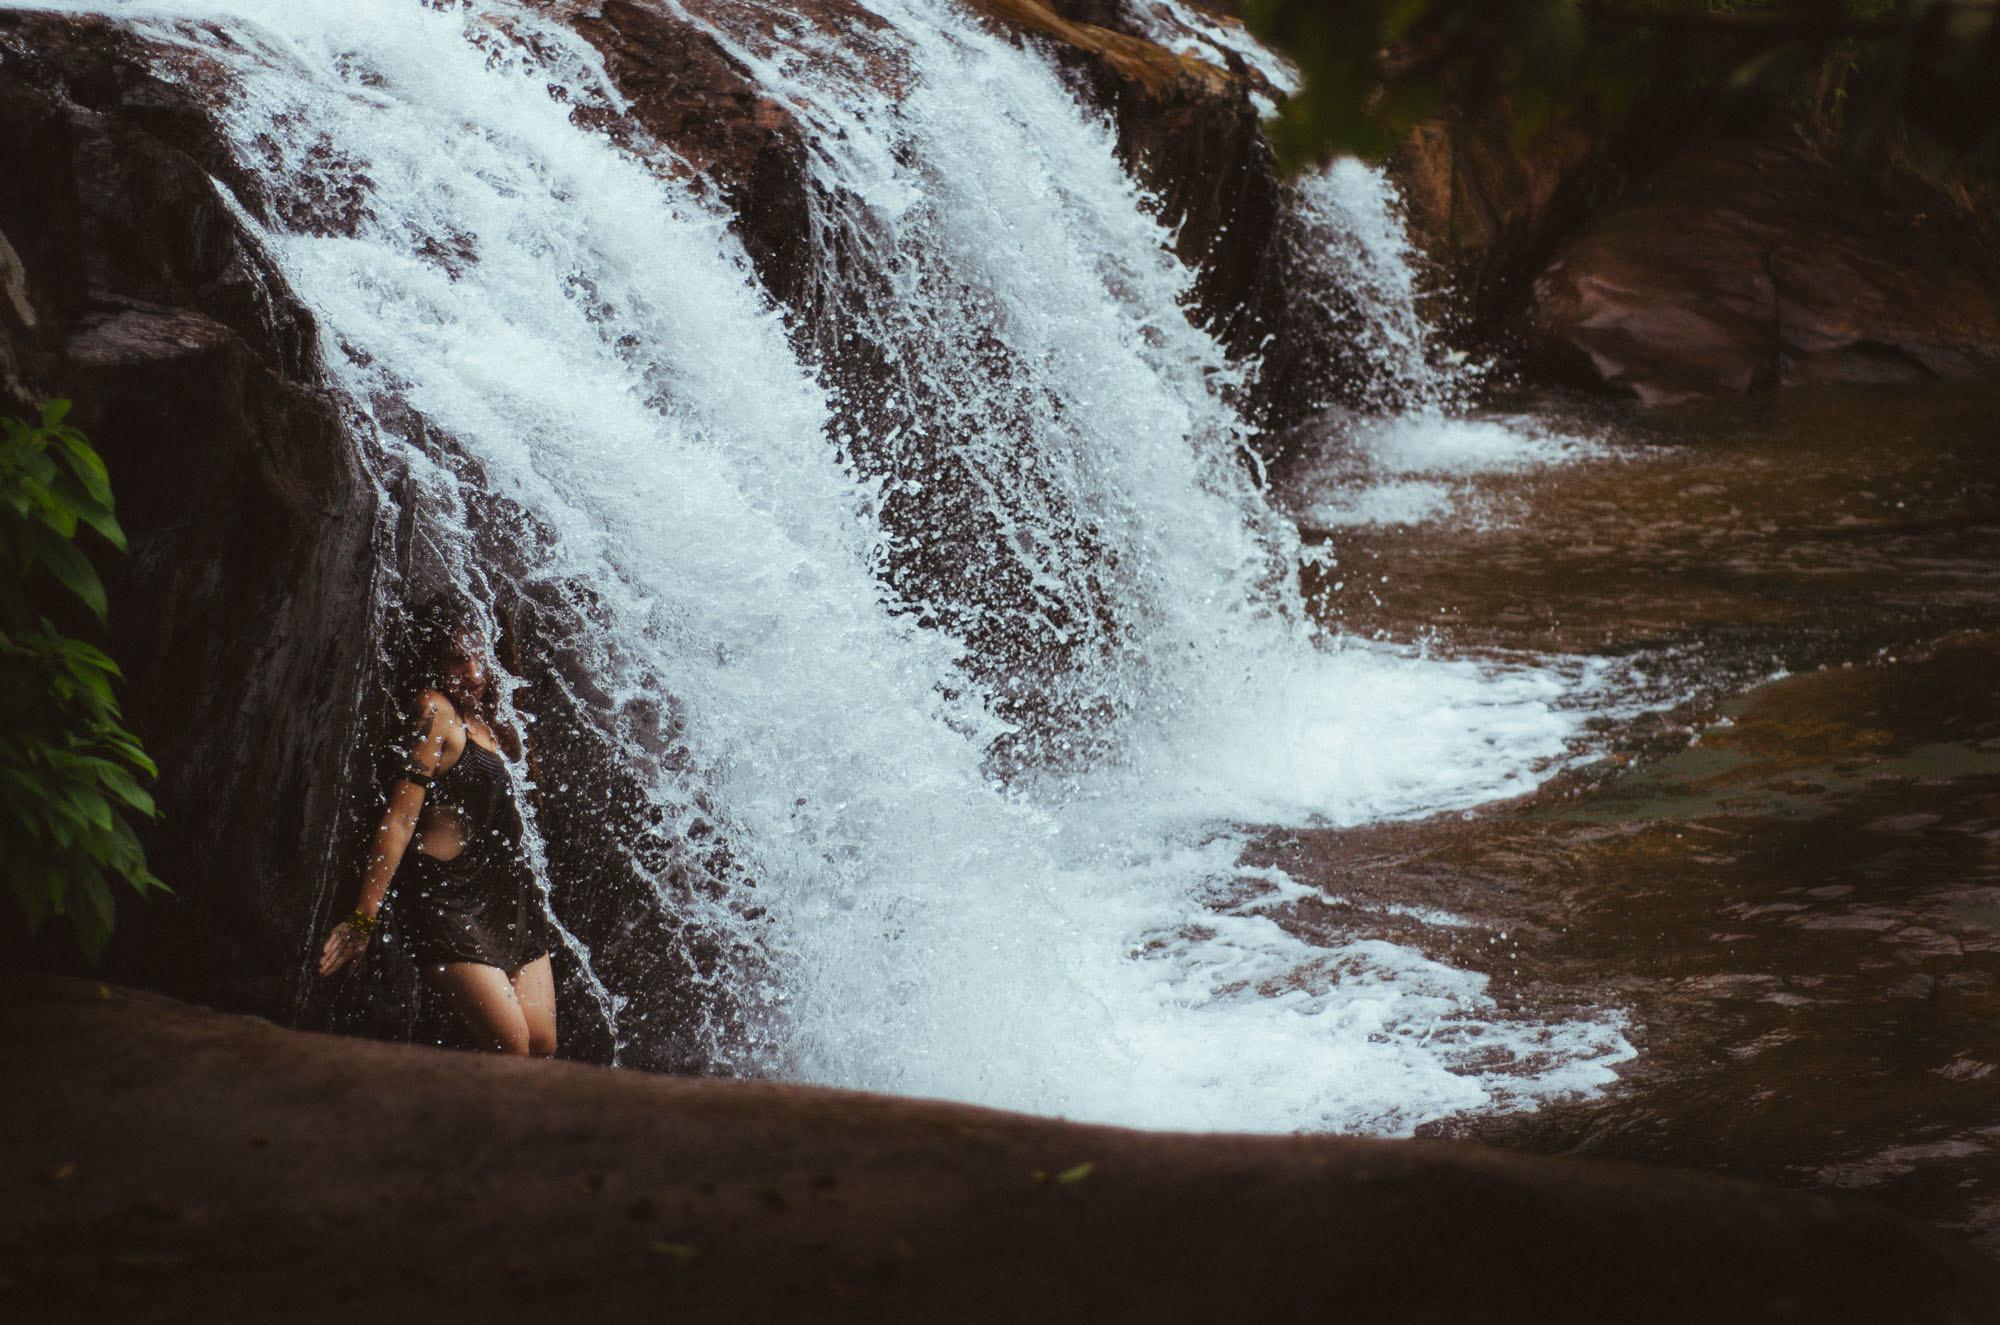 cachoeira-prumirim-ubatuba-set-16-98